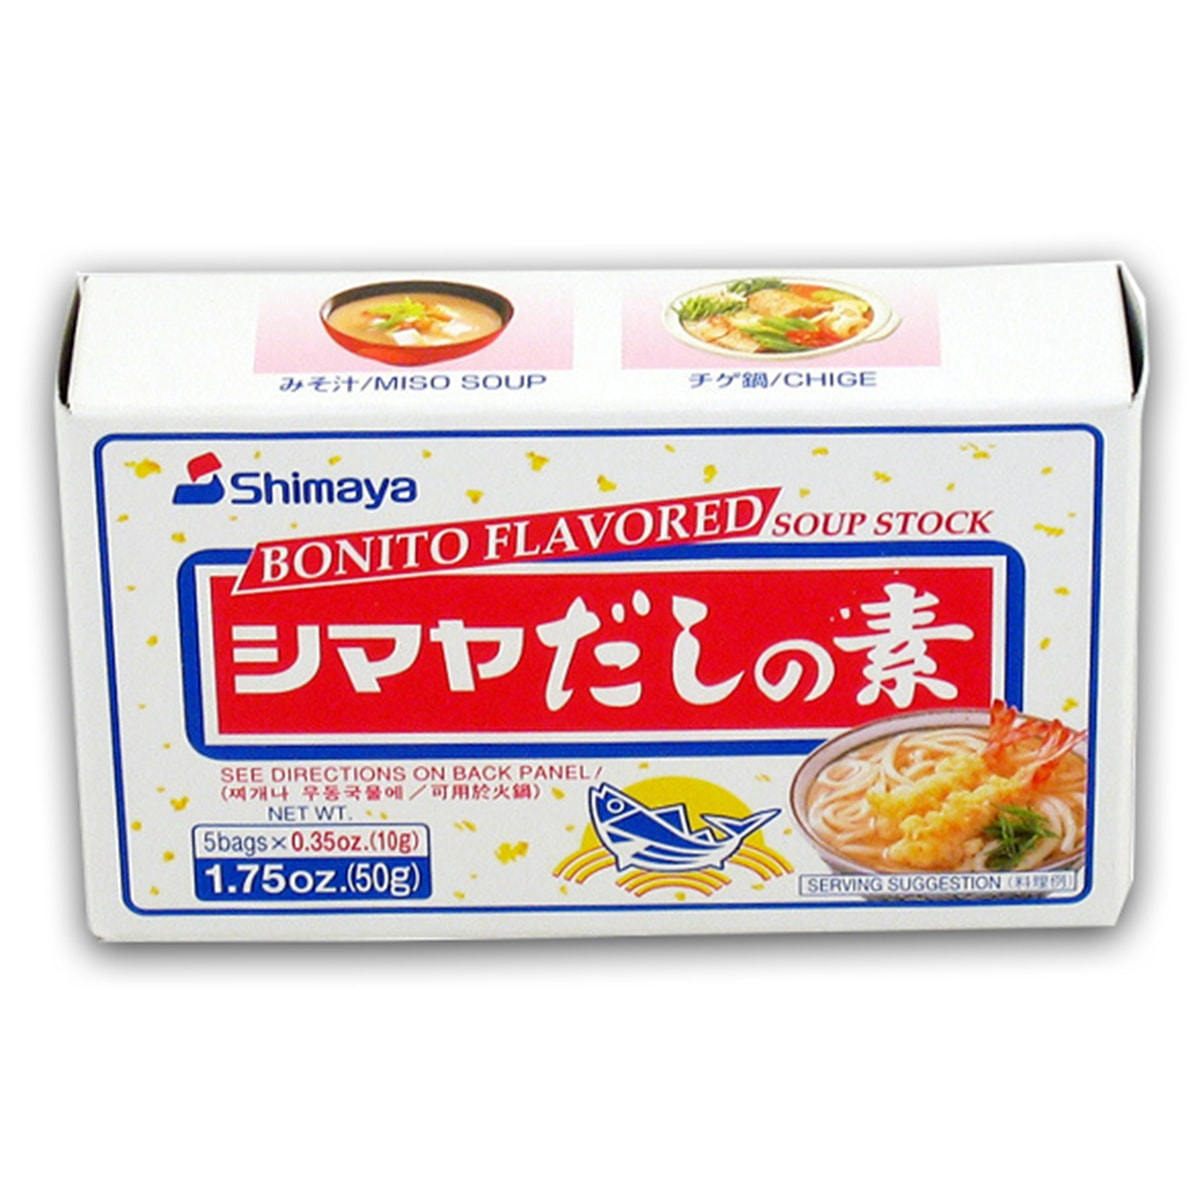 Buy Shimaya Dashi No Moto or Soup Stock (Bonito Flavored Seasoning) - 50 gm